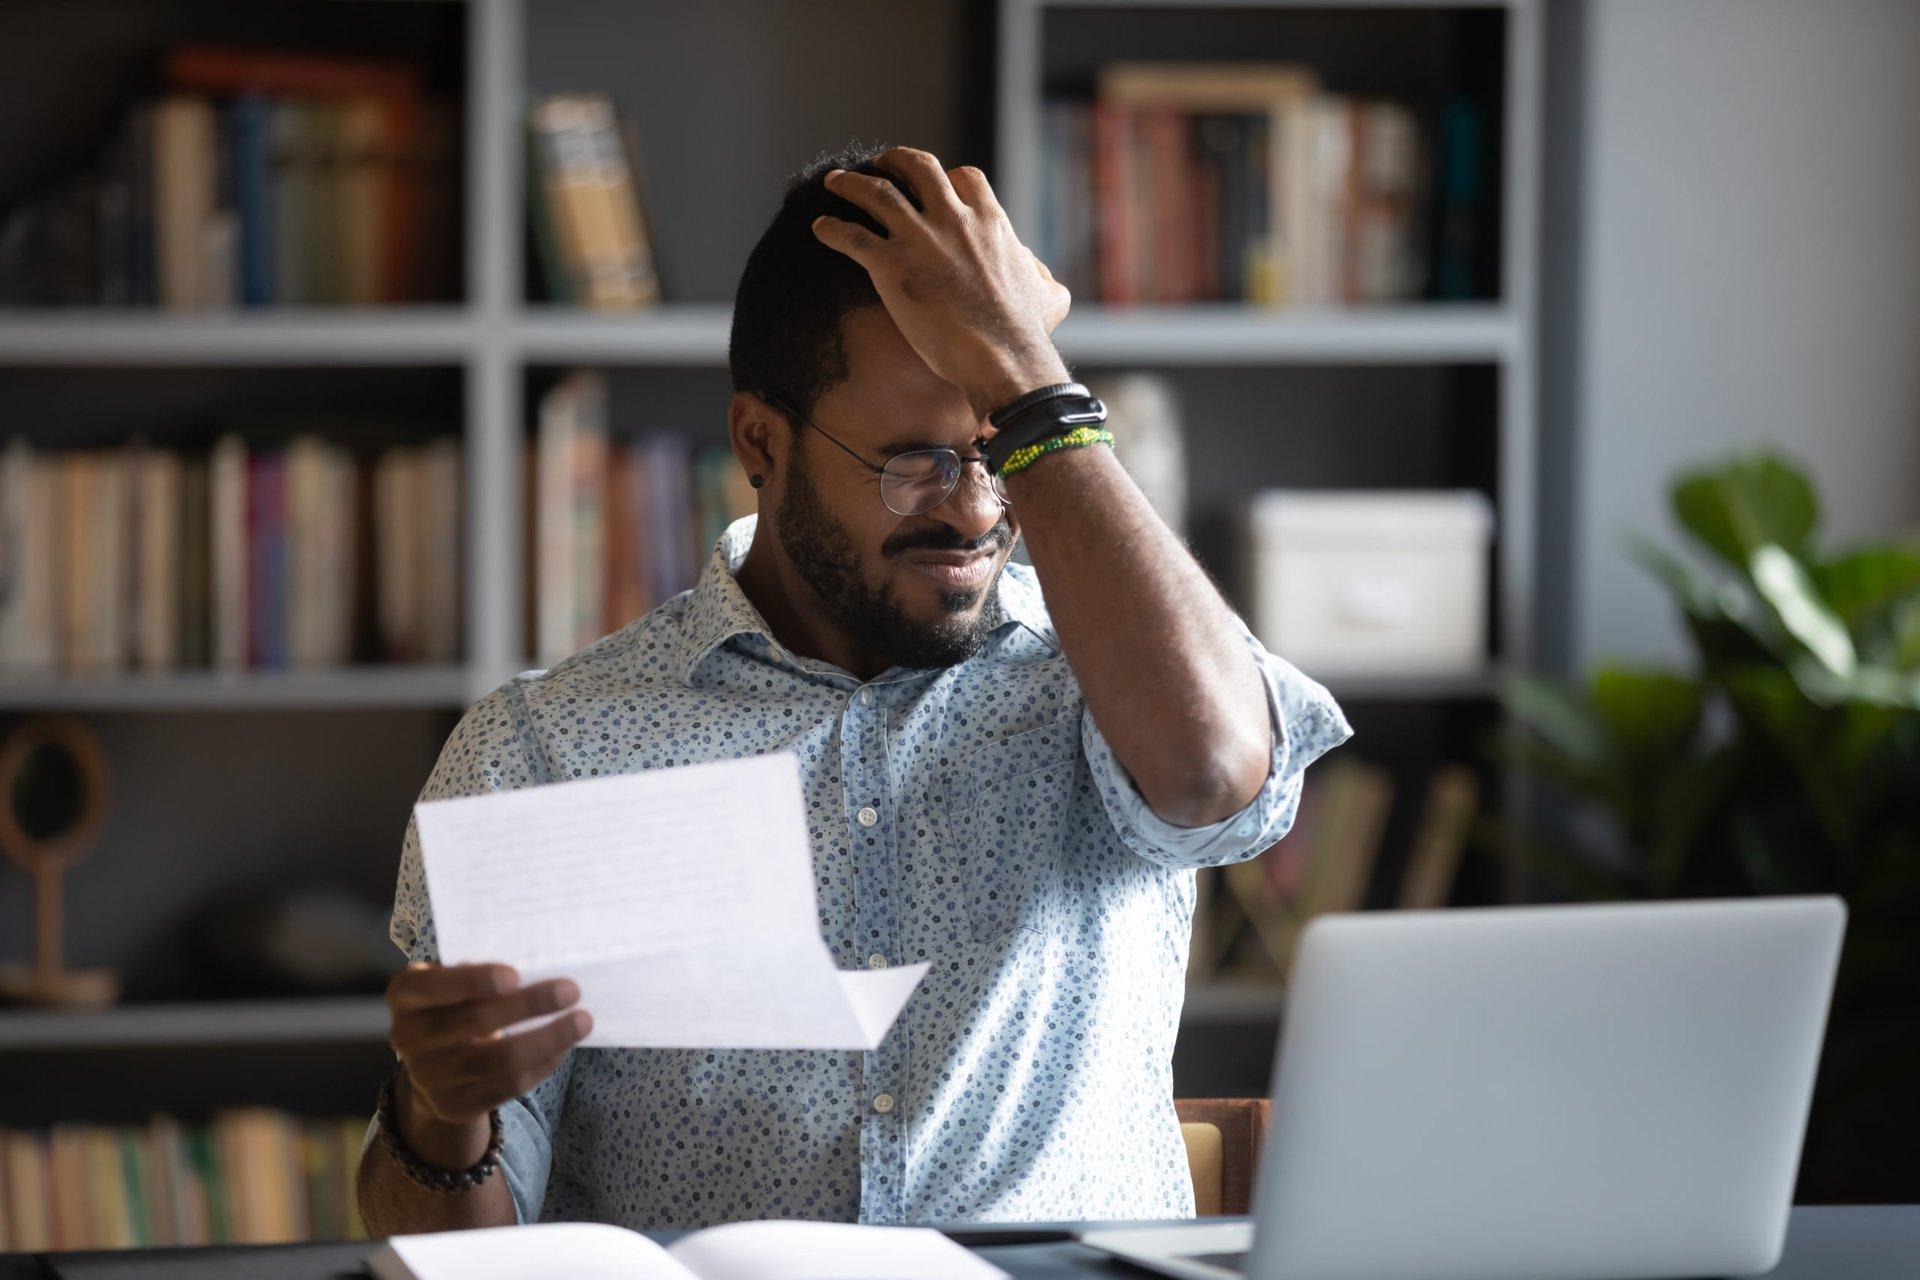 Man upset over bank fee